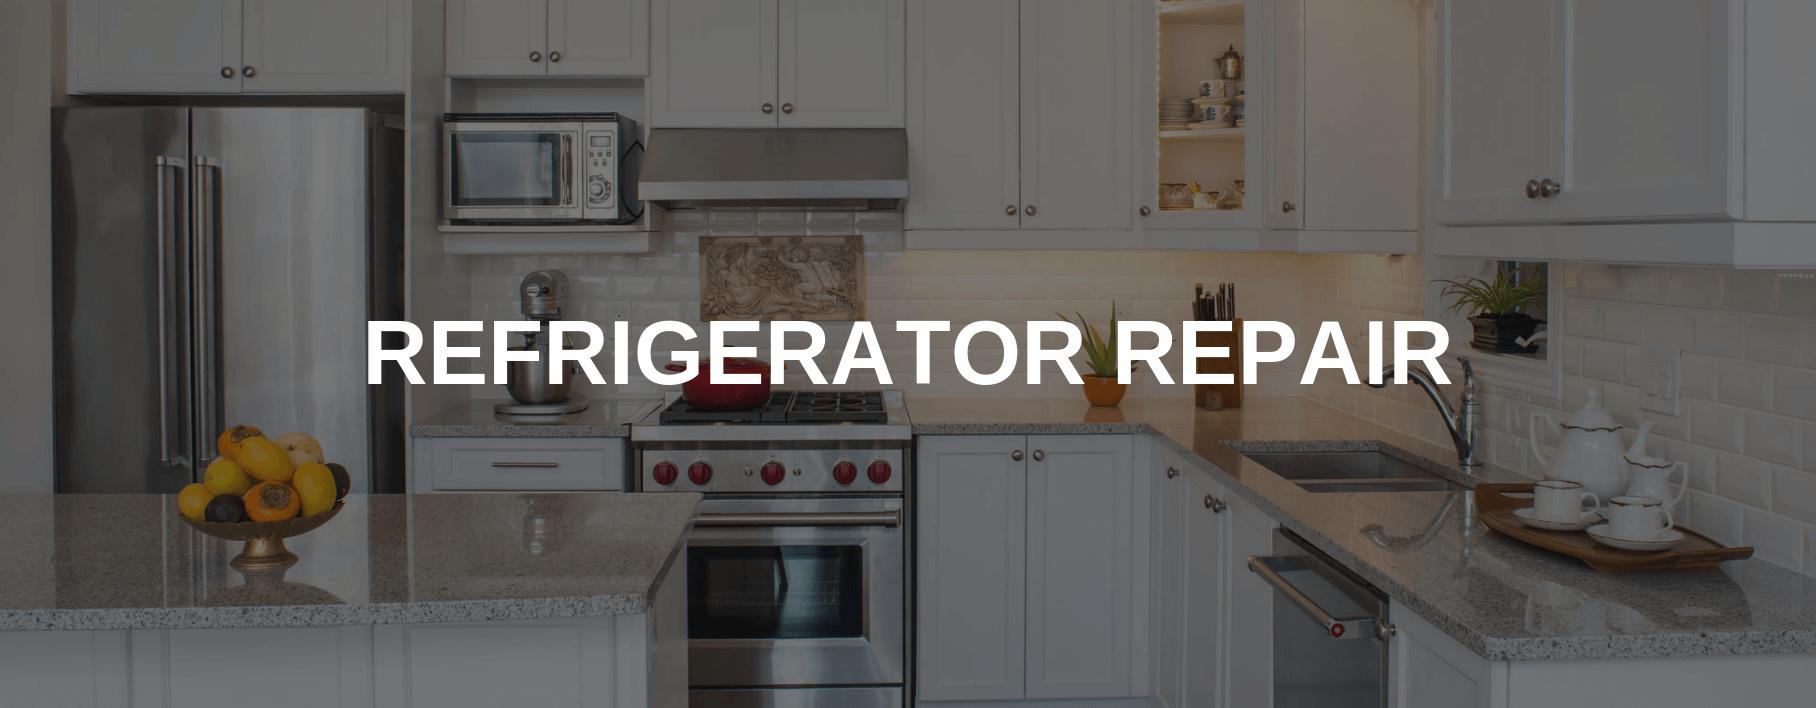 refrigerator repair west haven